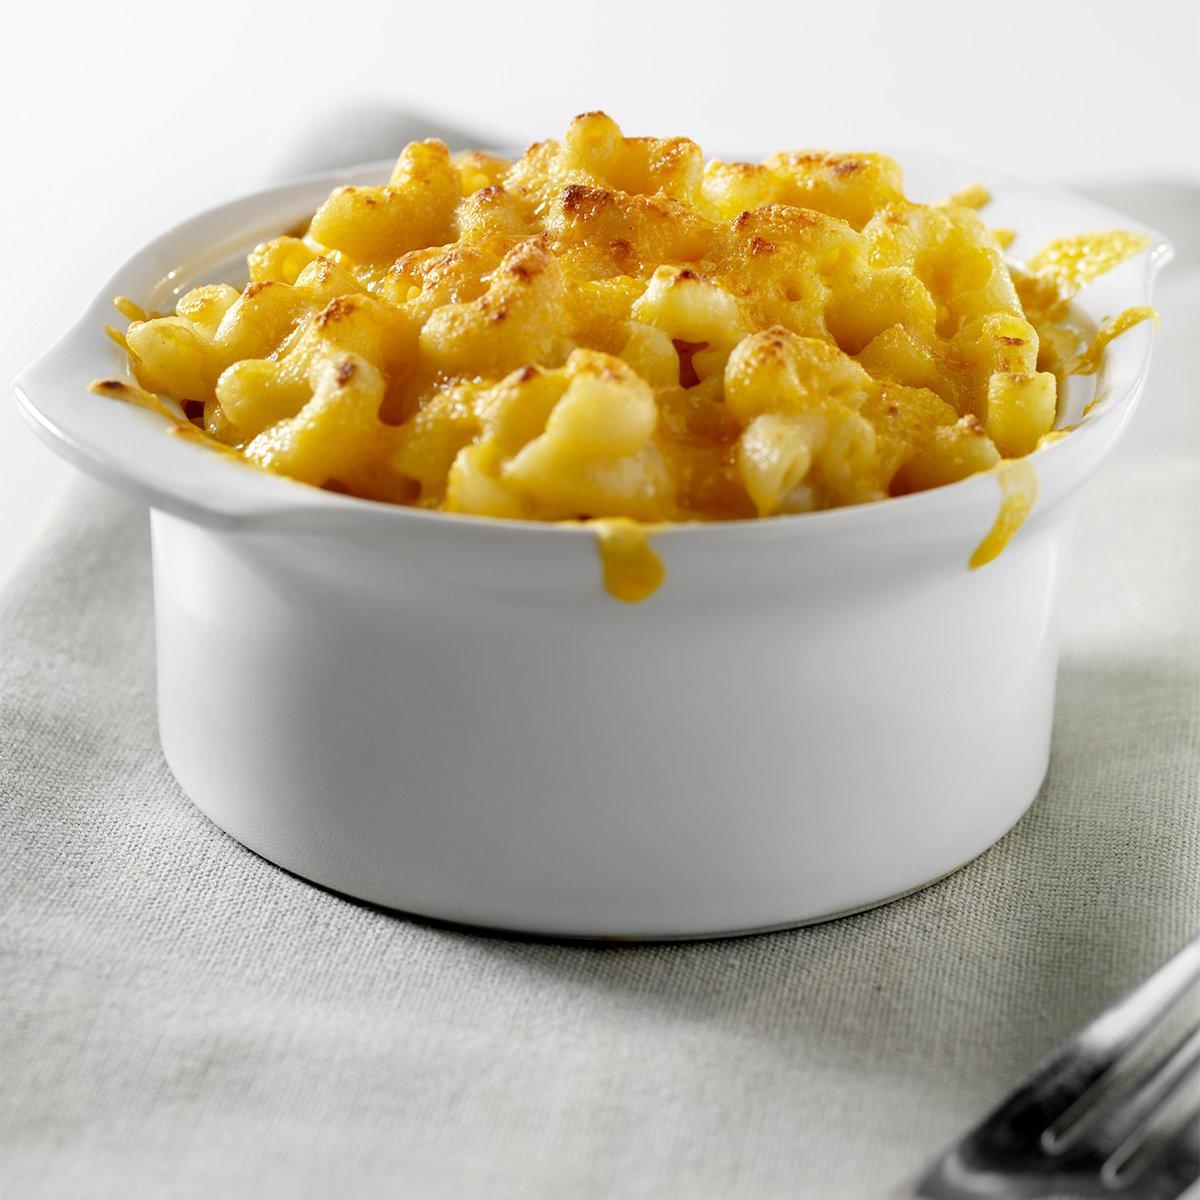 I'm sharing the recipe for my BOMB mac & cheese! I'm making this 4 Thanksgiving!!! https://t.co/AH2aWEZFcI https://t.co/5xpGwq4XbZ